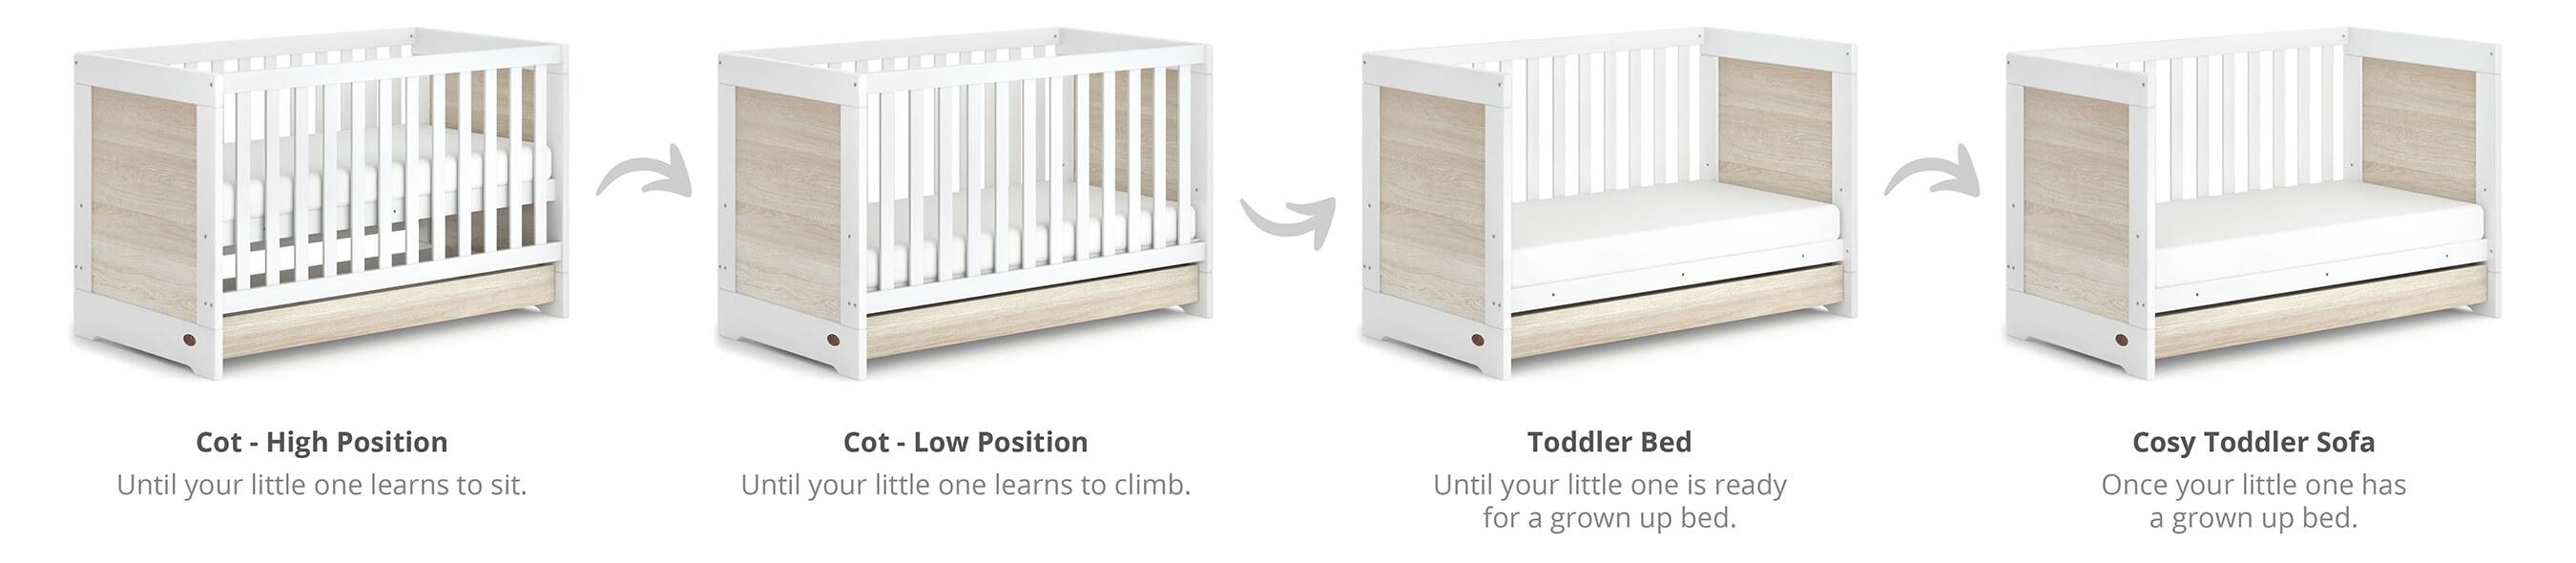 baby-barn-discounts-boori-elite-cot-conversion.jpg